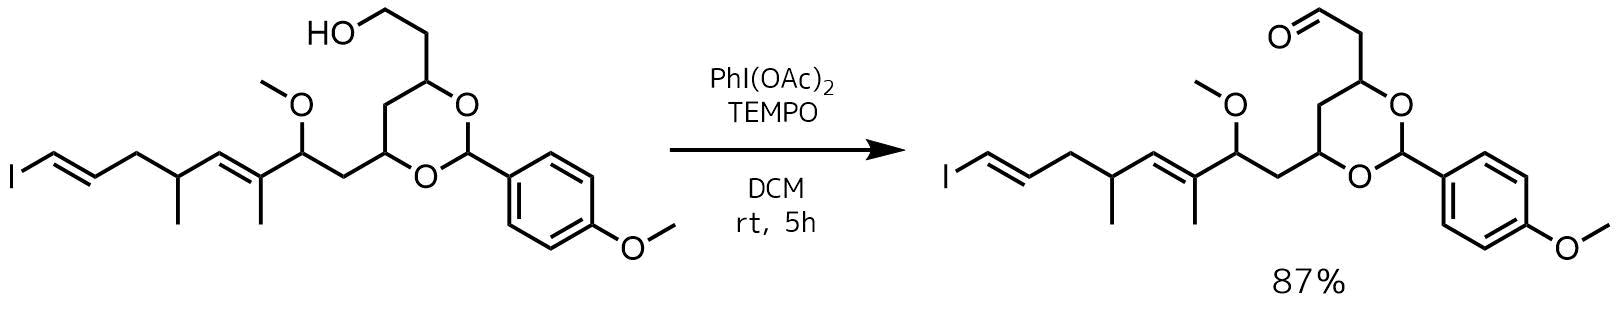 TEMPO酸化ーPh(OAc)I